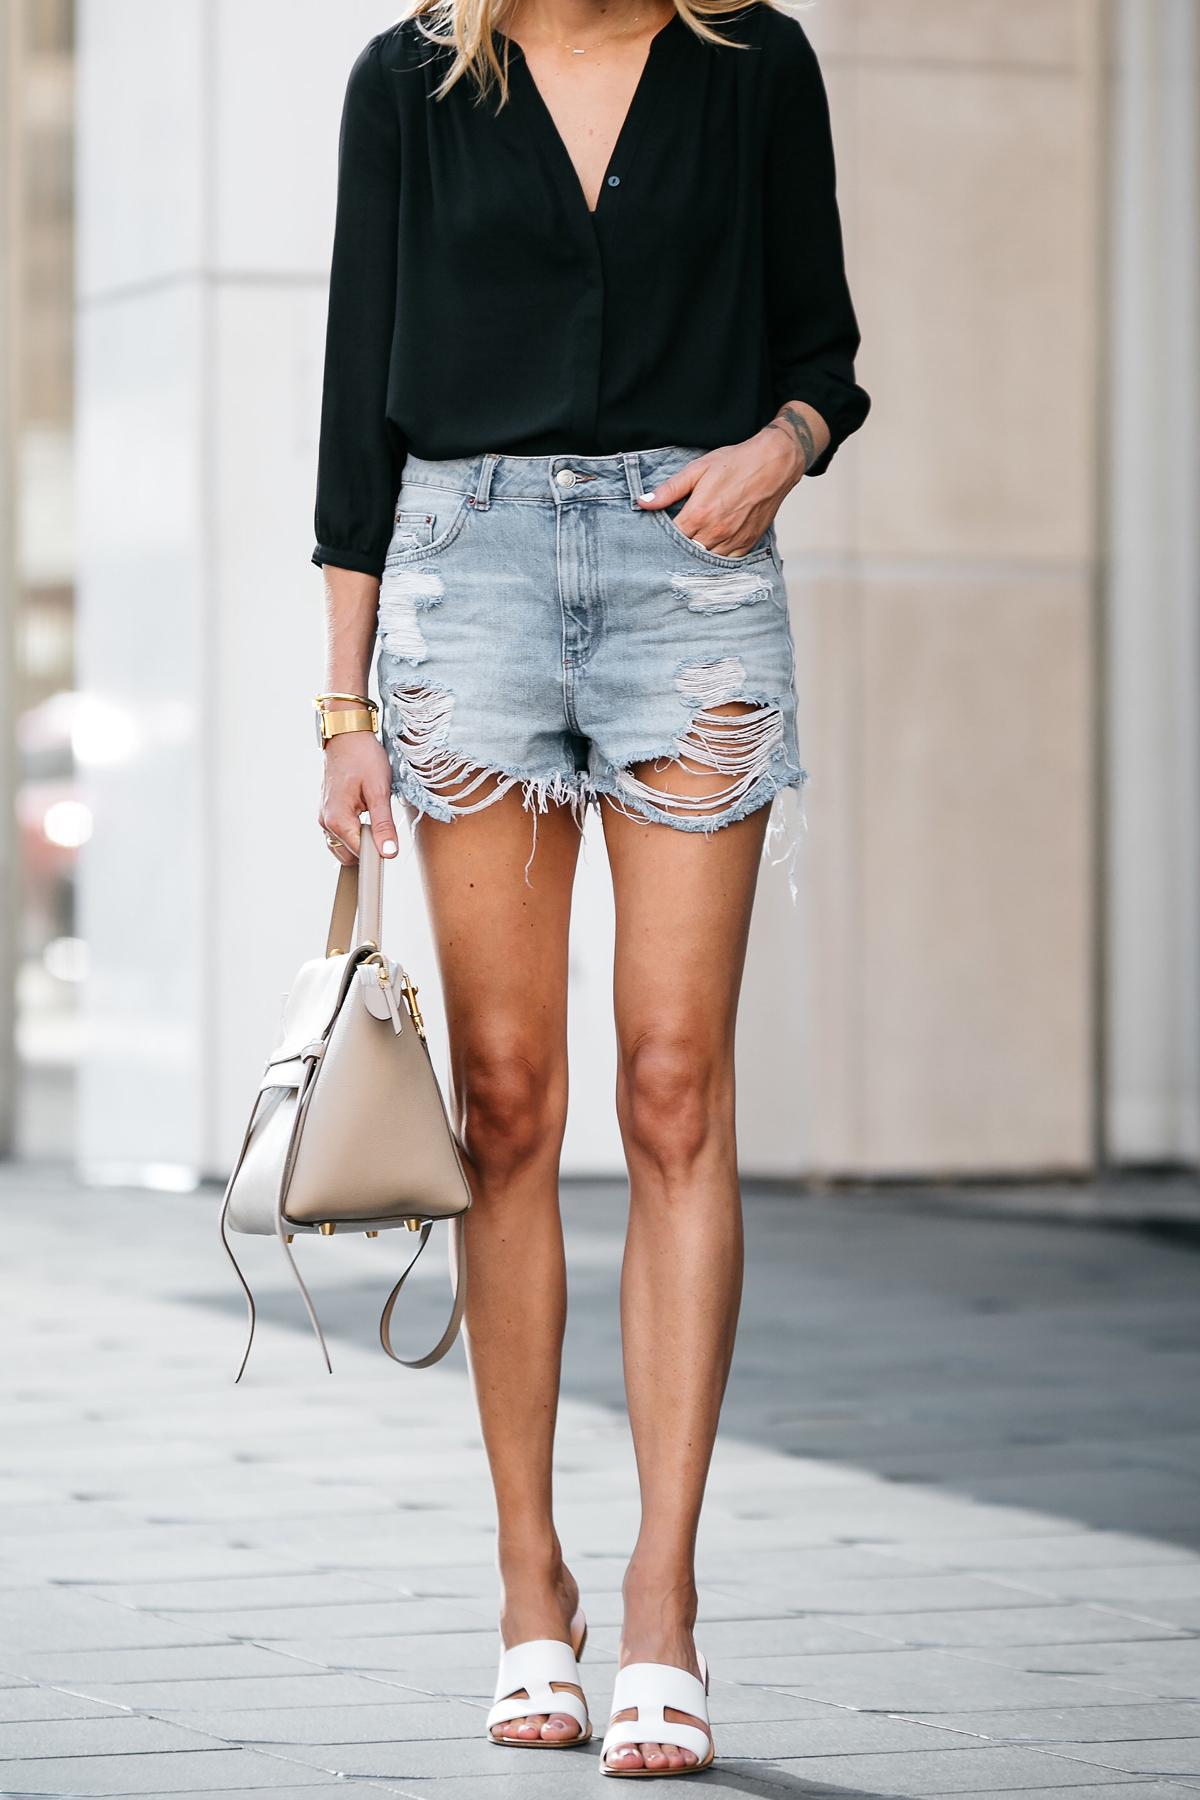 Nodstrom Black Long Sleeve Button Down Blouse Topshop Denim Ripped Mom Shorts Outfit Celine Belt Bag Everlane White Bridge Sandals Fashion Jackson Dallas Blogger Fashion Blogger Street Style